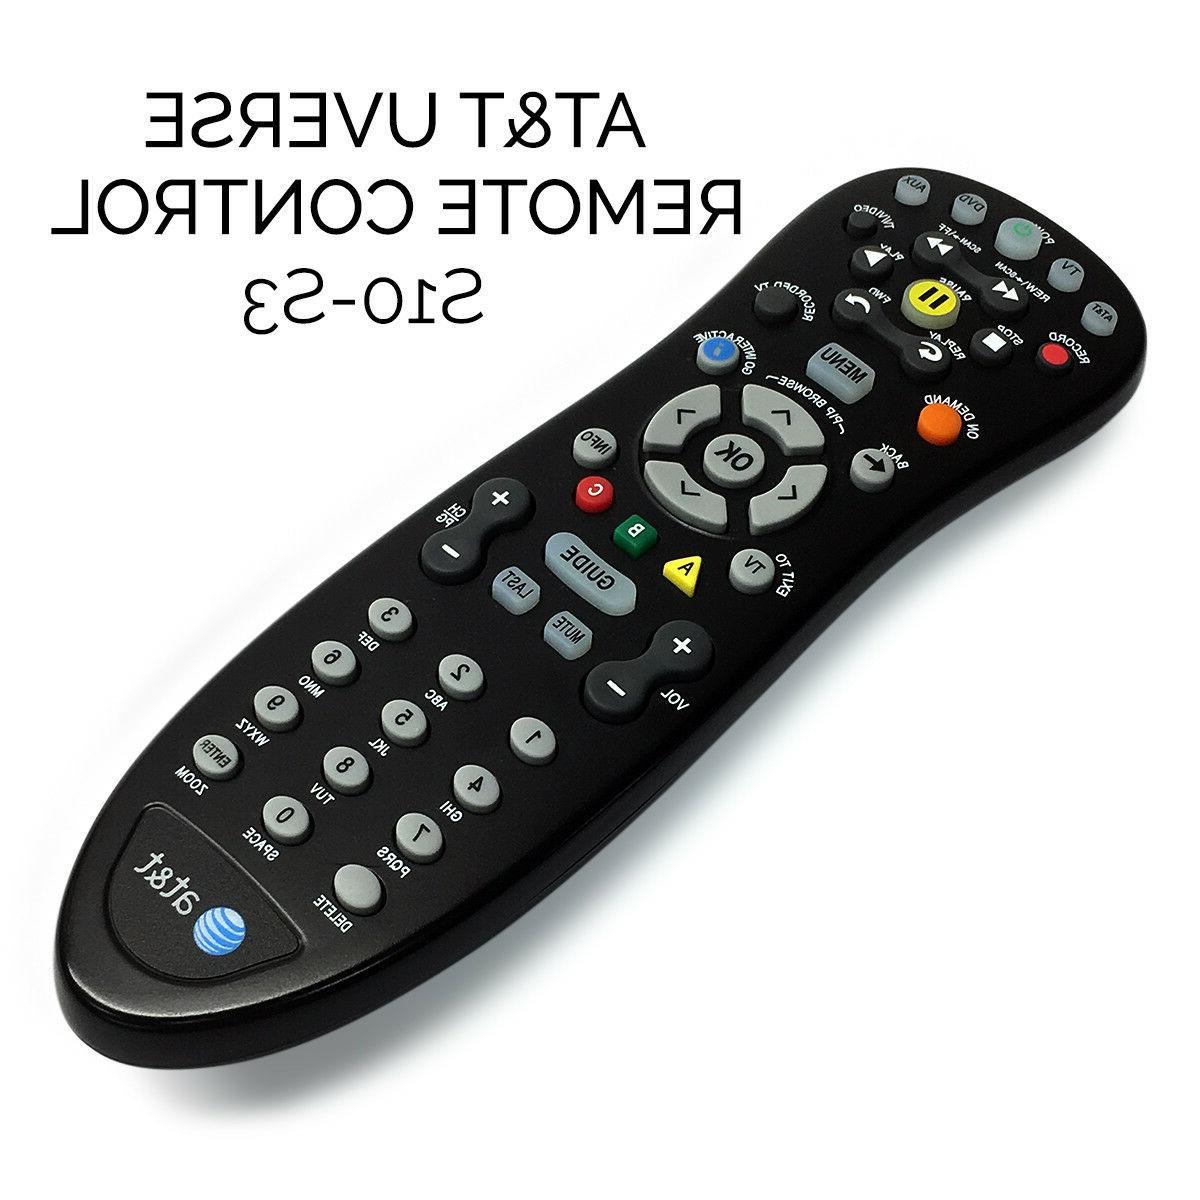 Original AT&T Uverse HD TV